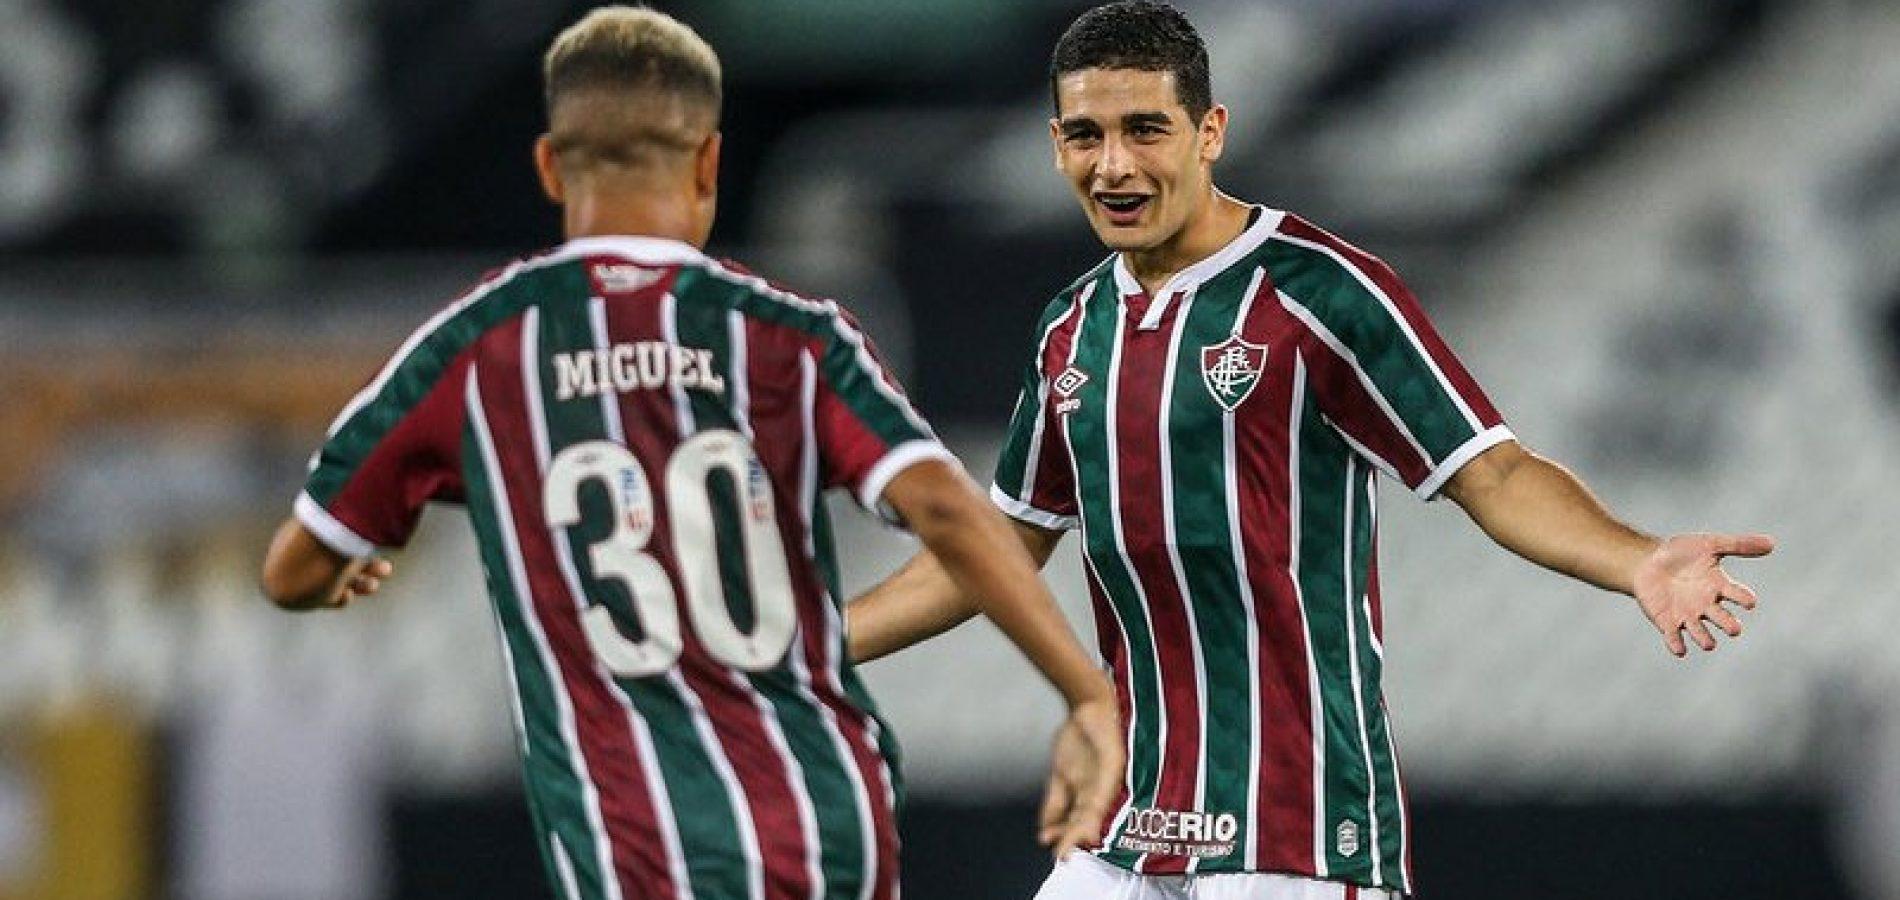 Botafogo perde pênalti e Fluminense vence 1º amistoso do Troféu Gerson e Didi